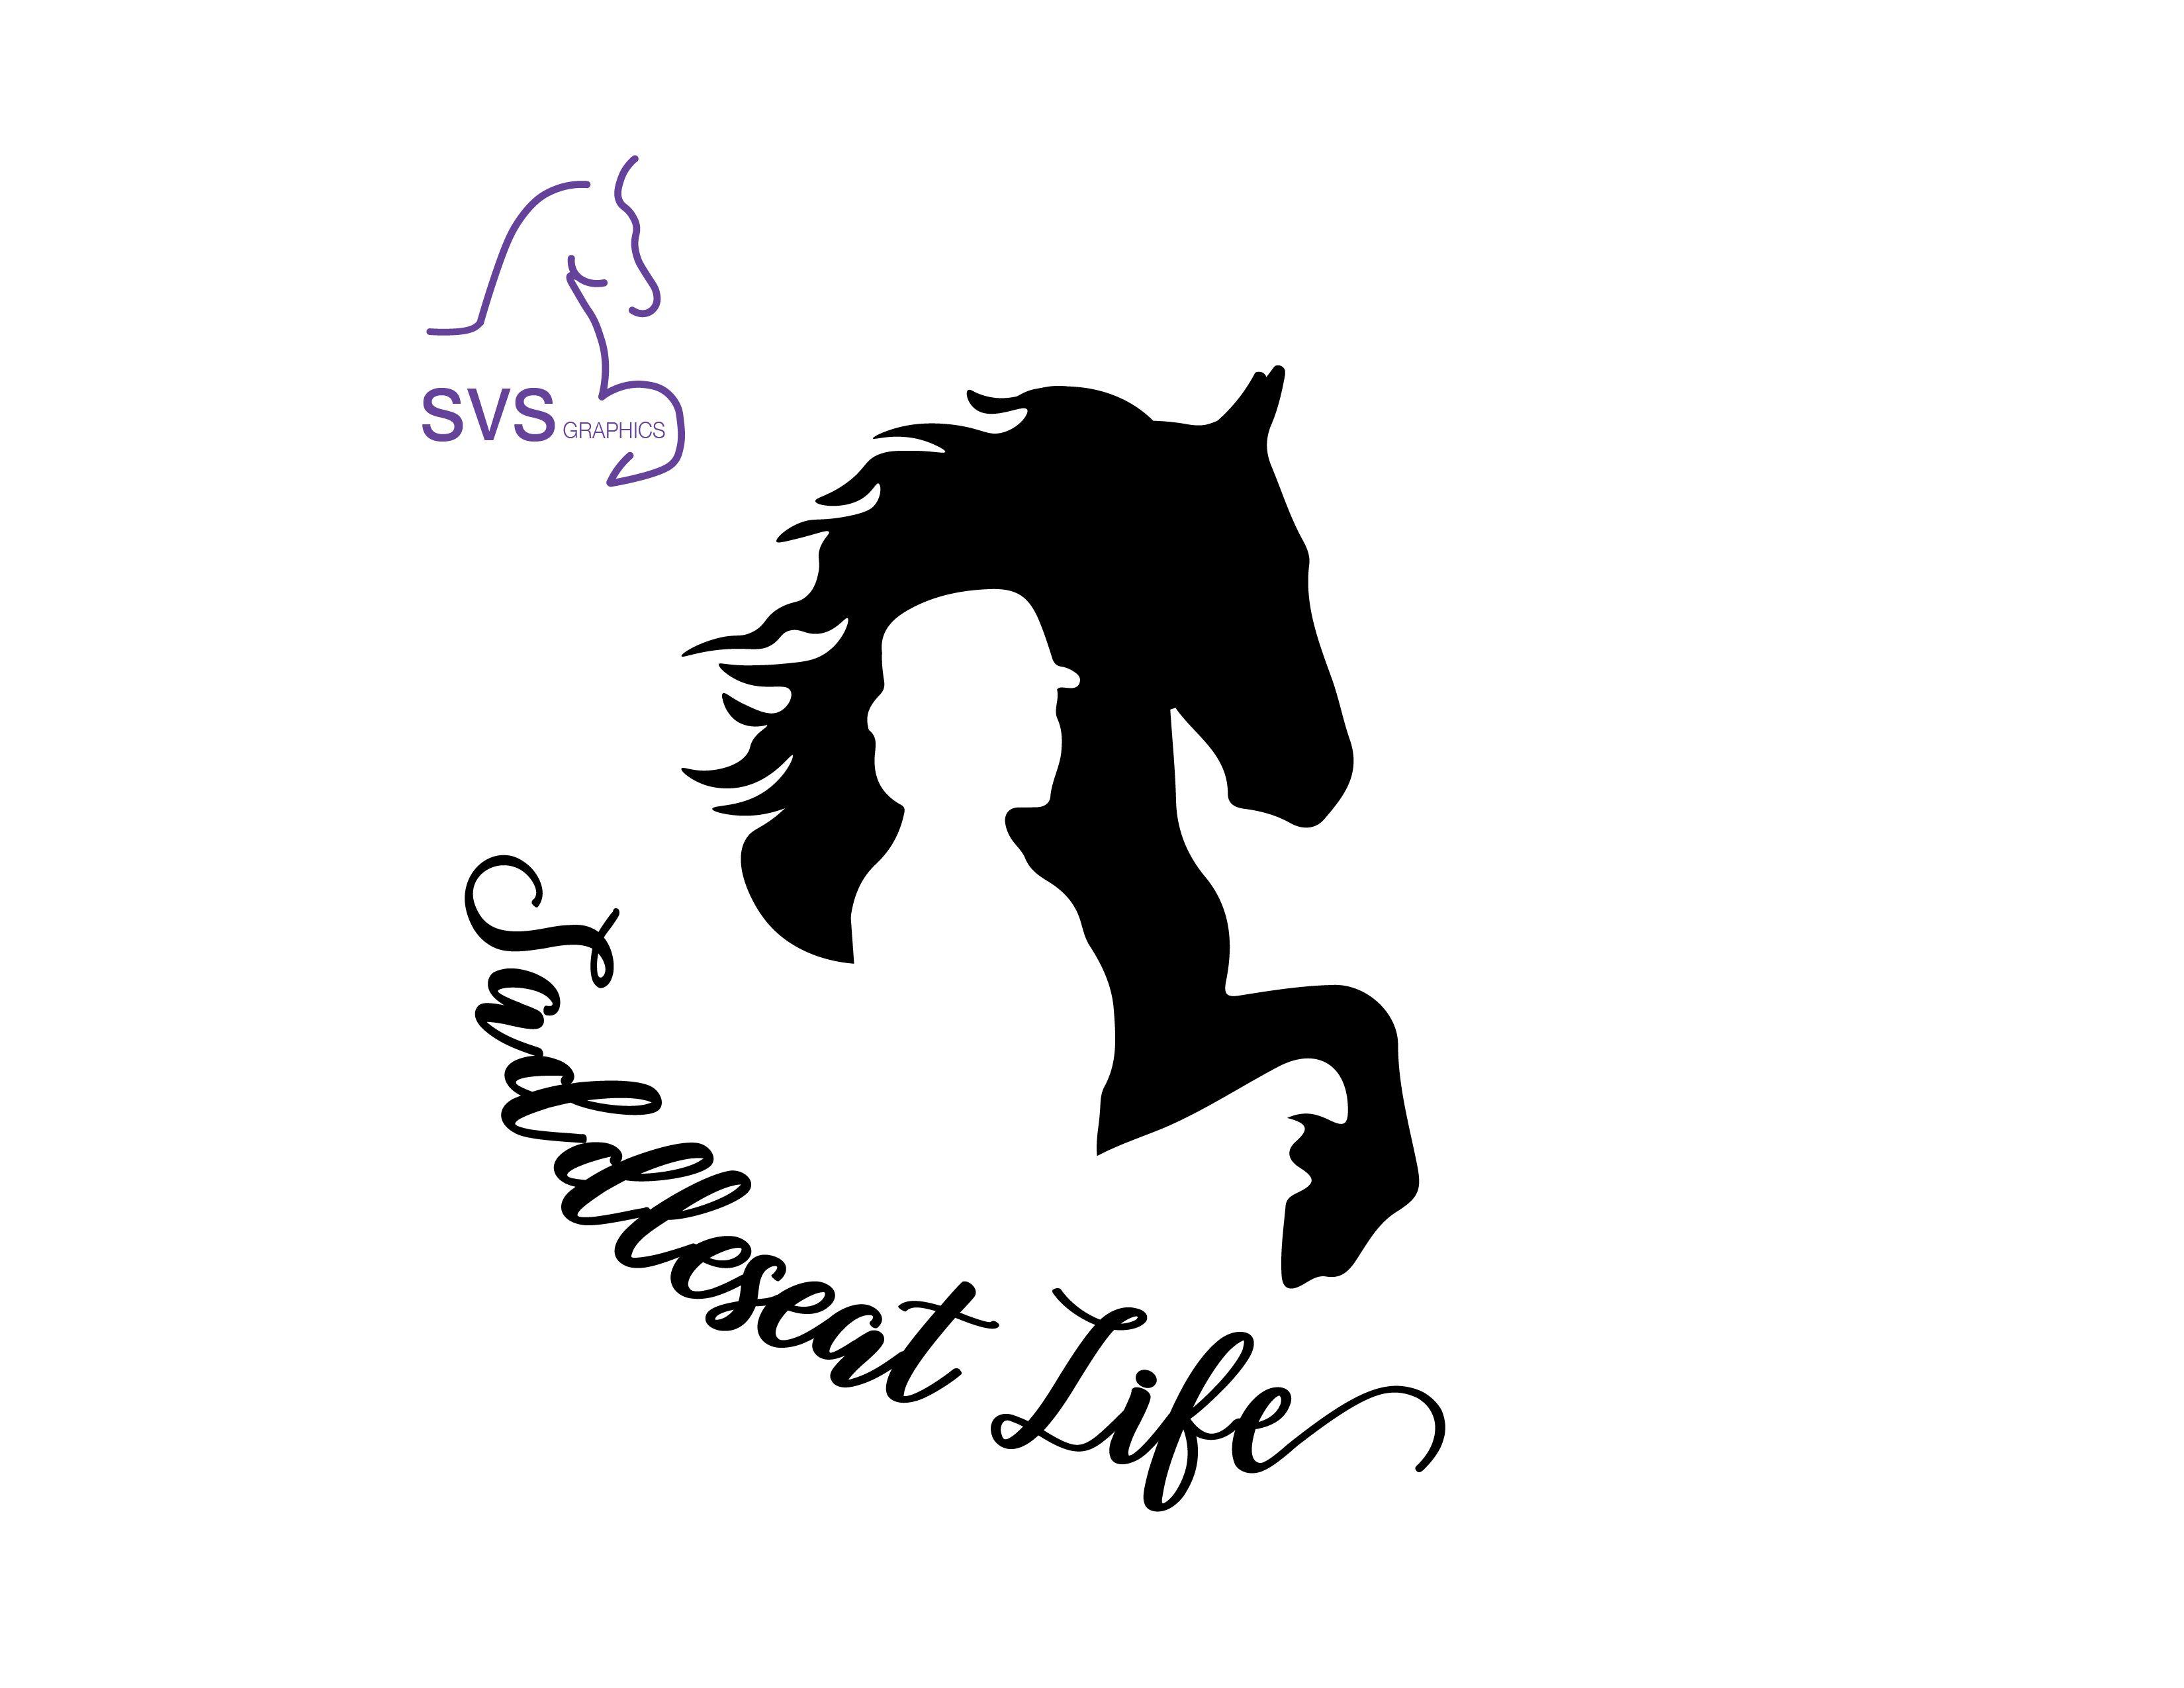 New Saddleseat Life Friesian Horse 4x5 Vinyl Car Decal Car Decals Vinyl Horse Riding Quotes Saddleseat Riding [ 2550 x 3300 Pixel ]